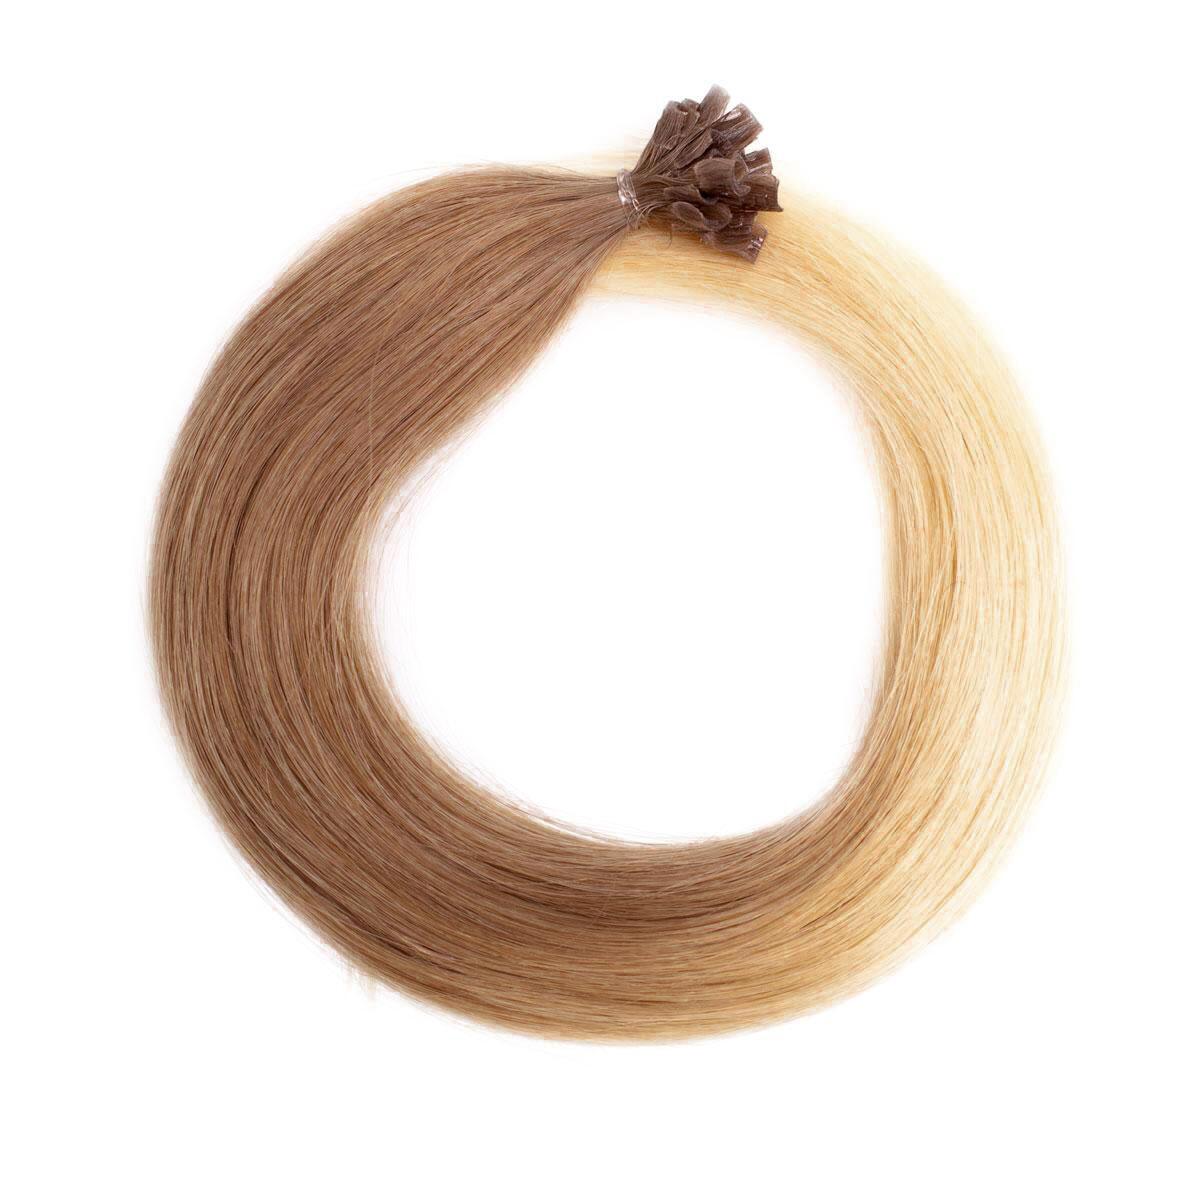 Nail Hair Original O7.3/10.8 Cendre Ash Blond Ombre 50 cm